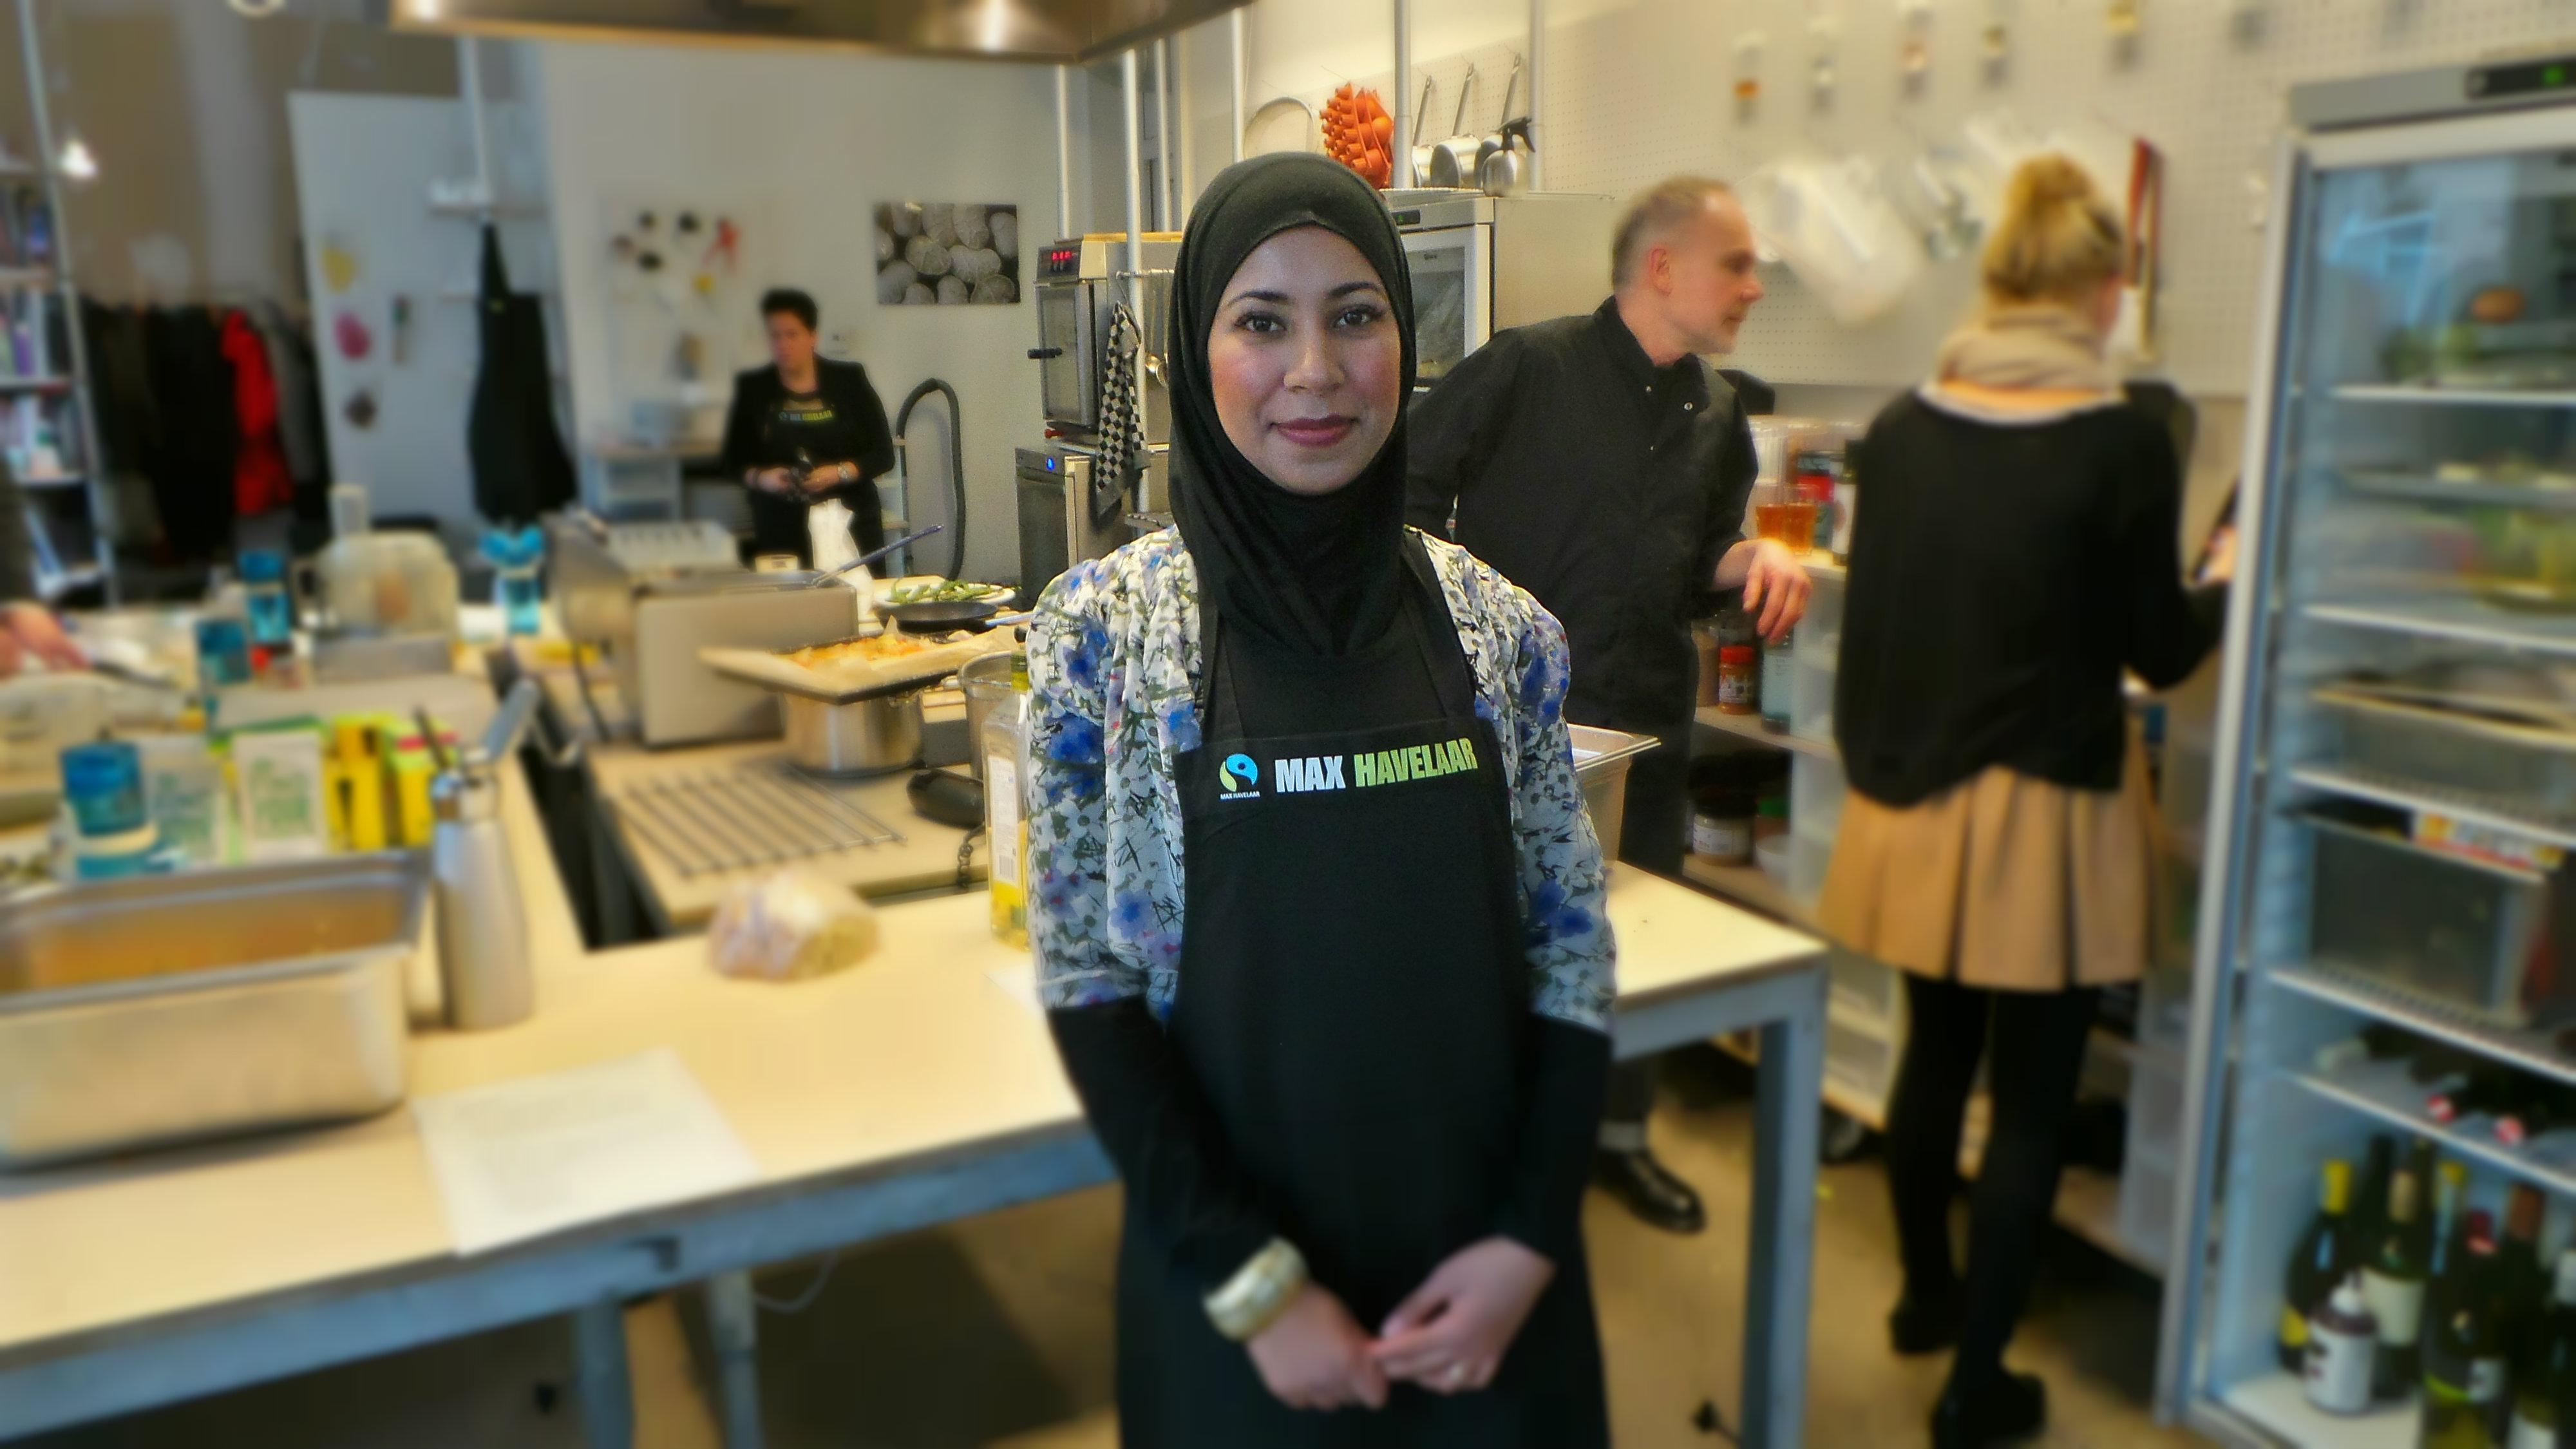 max_havelaar_theeworkshop_culinaire_werkplaats_amsterdam_delicious